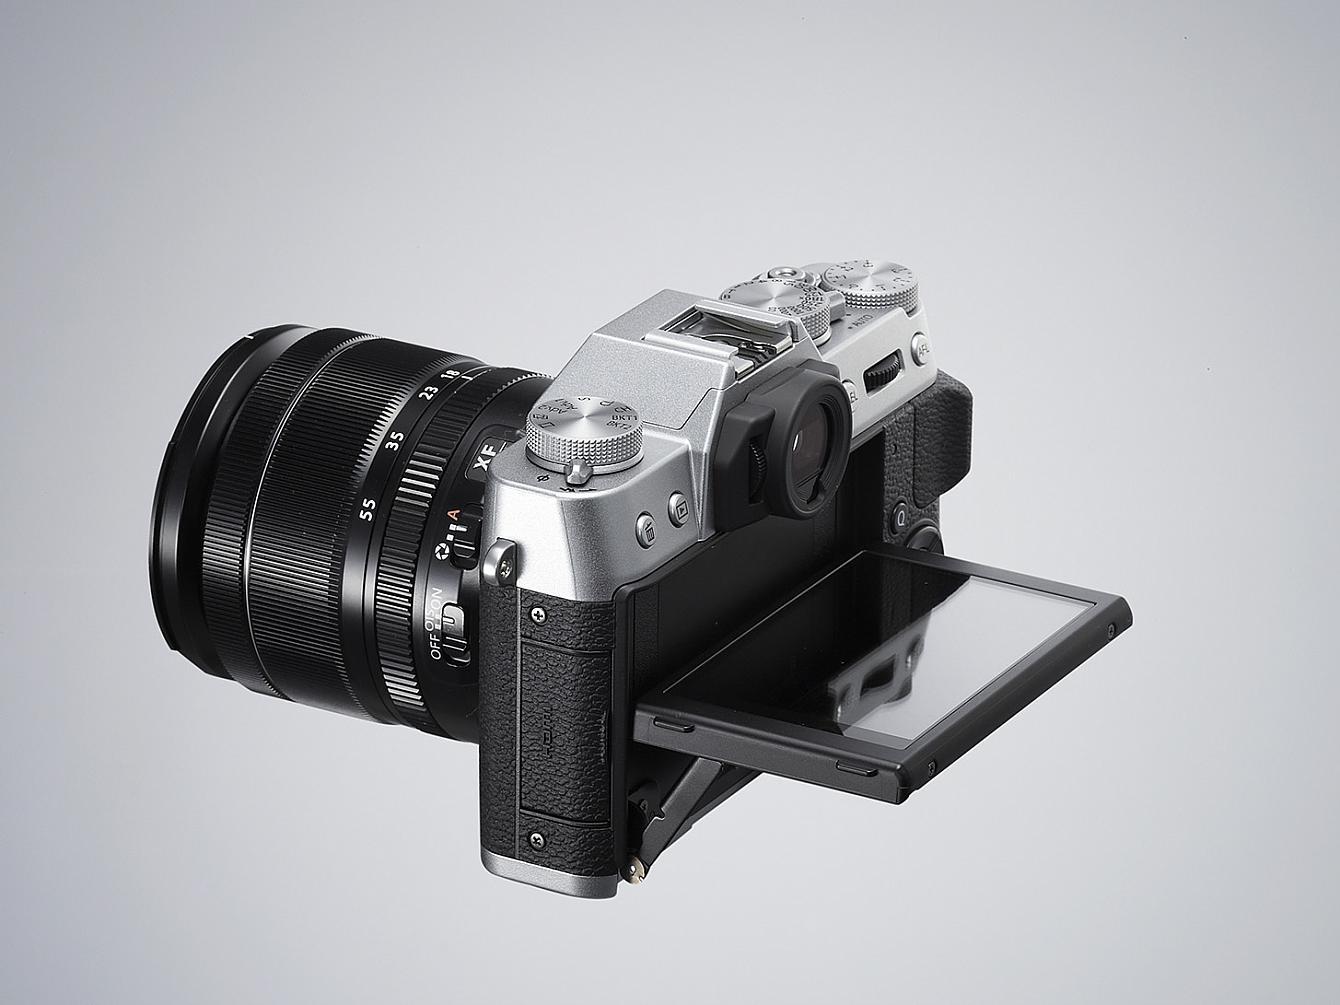 Fujifilm X-T10 bakifrån